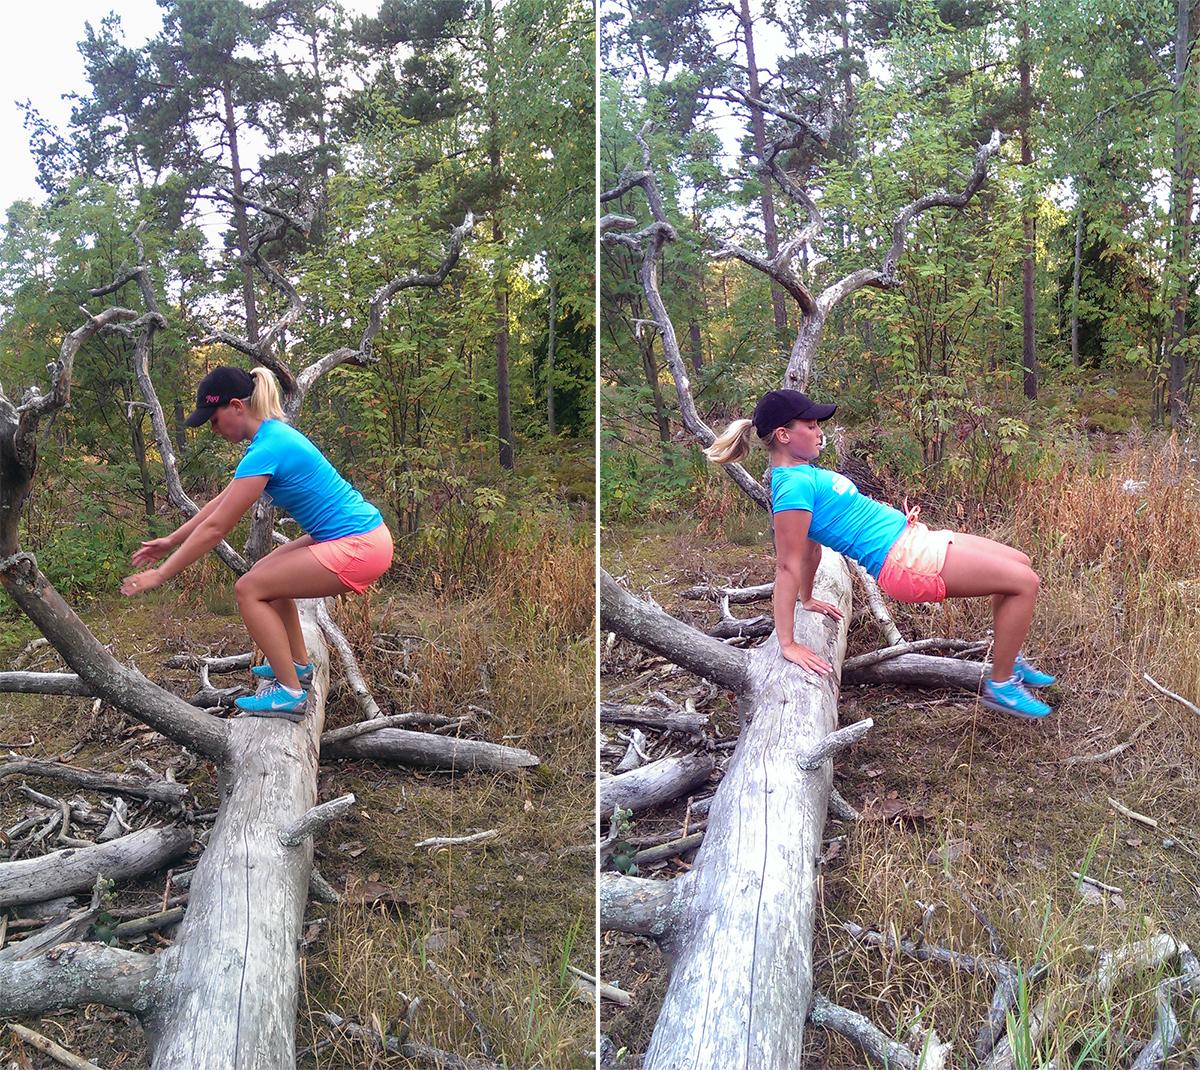 Träning ute i naturen